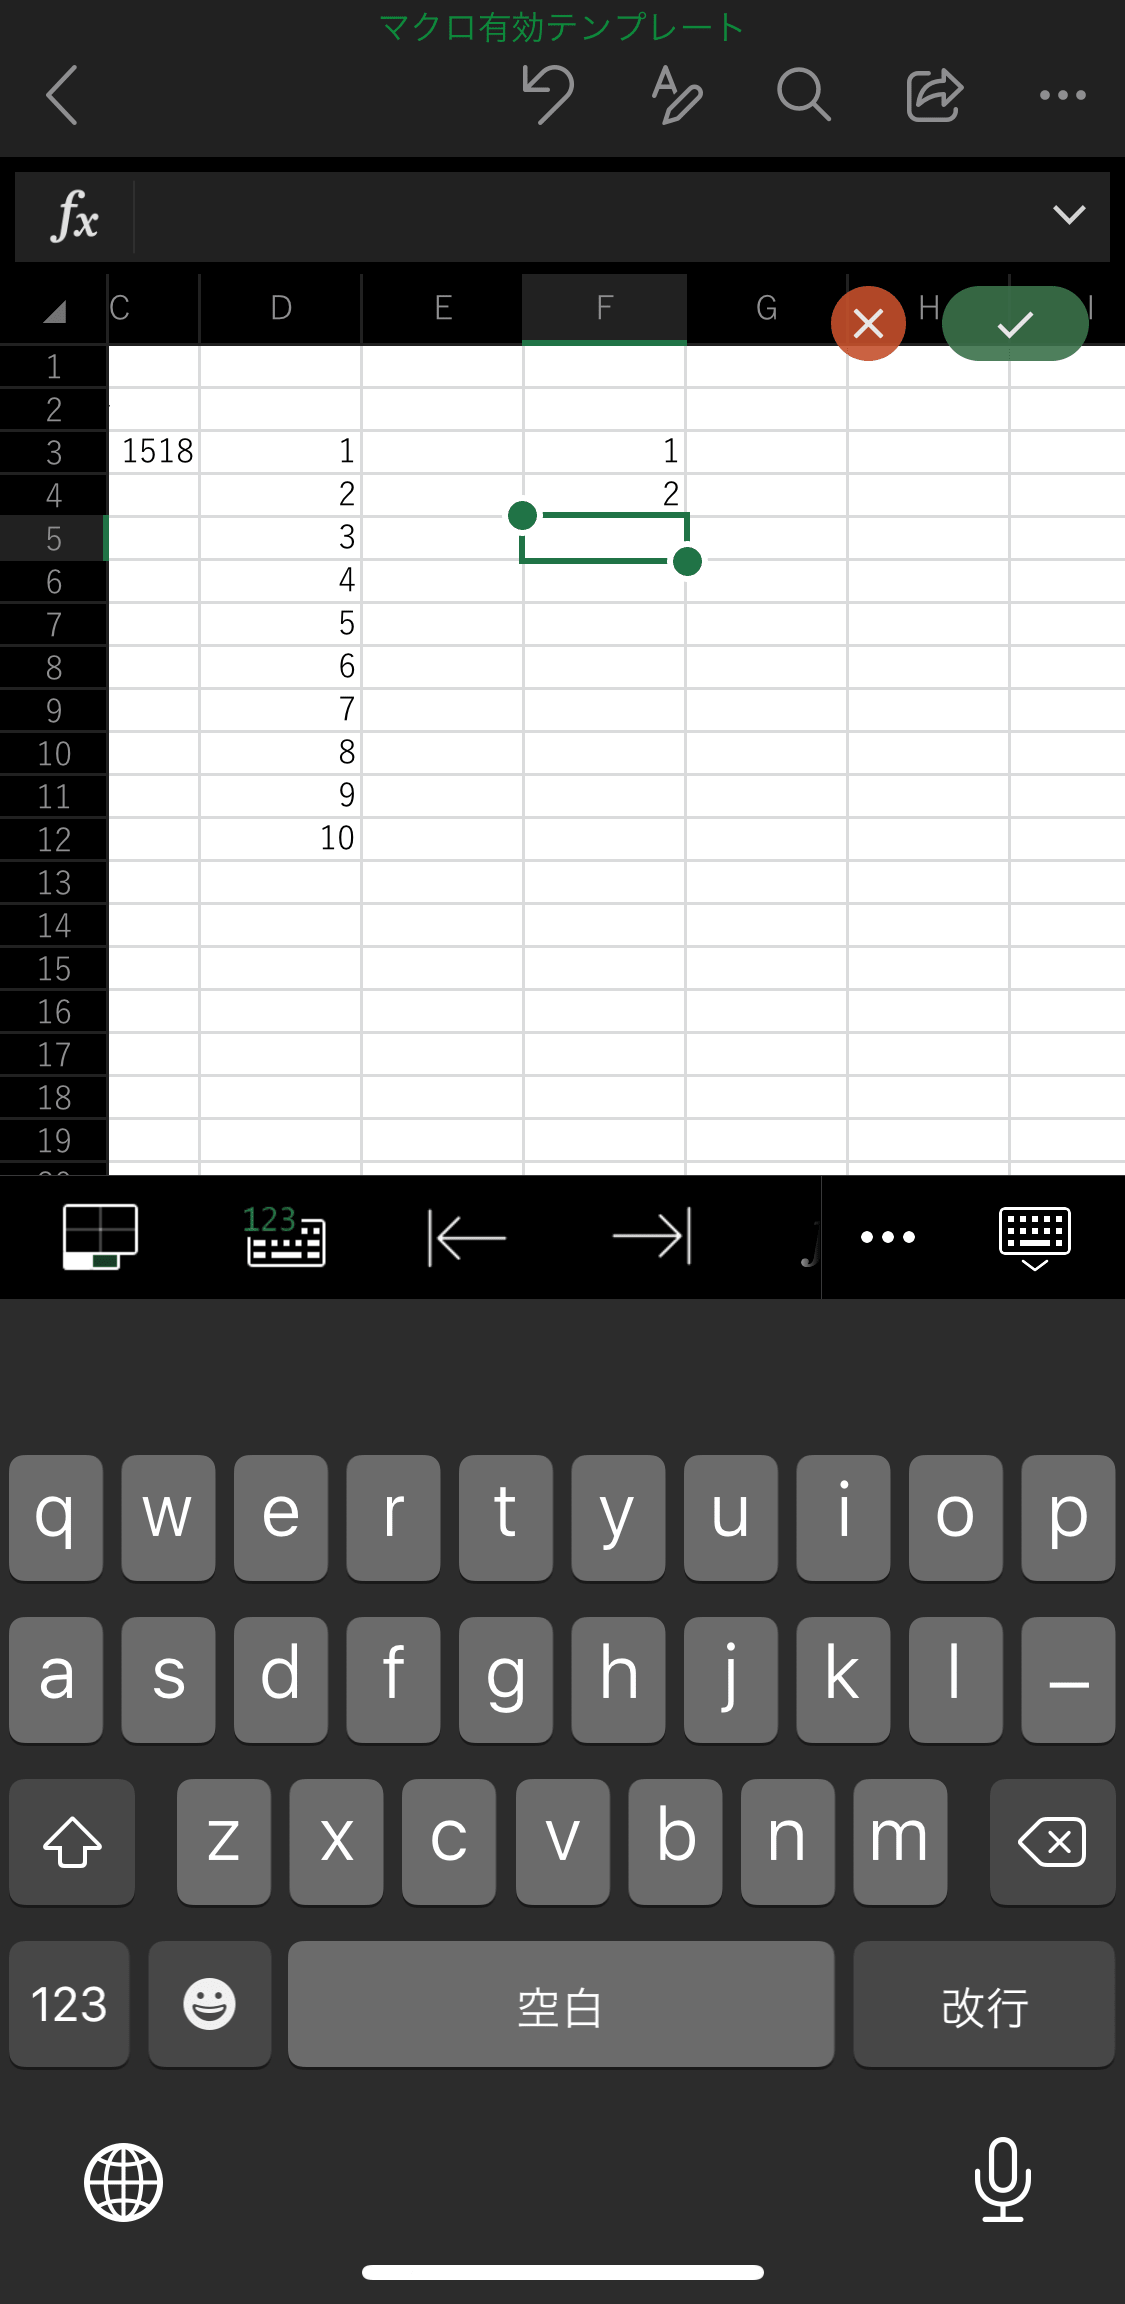 iPhoneでのエクセルアプリの使い方・編集方法・保存方法23